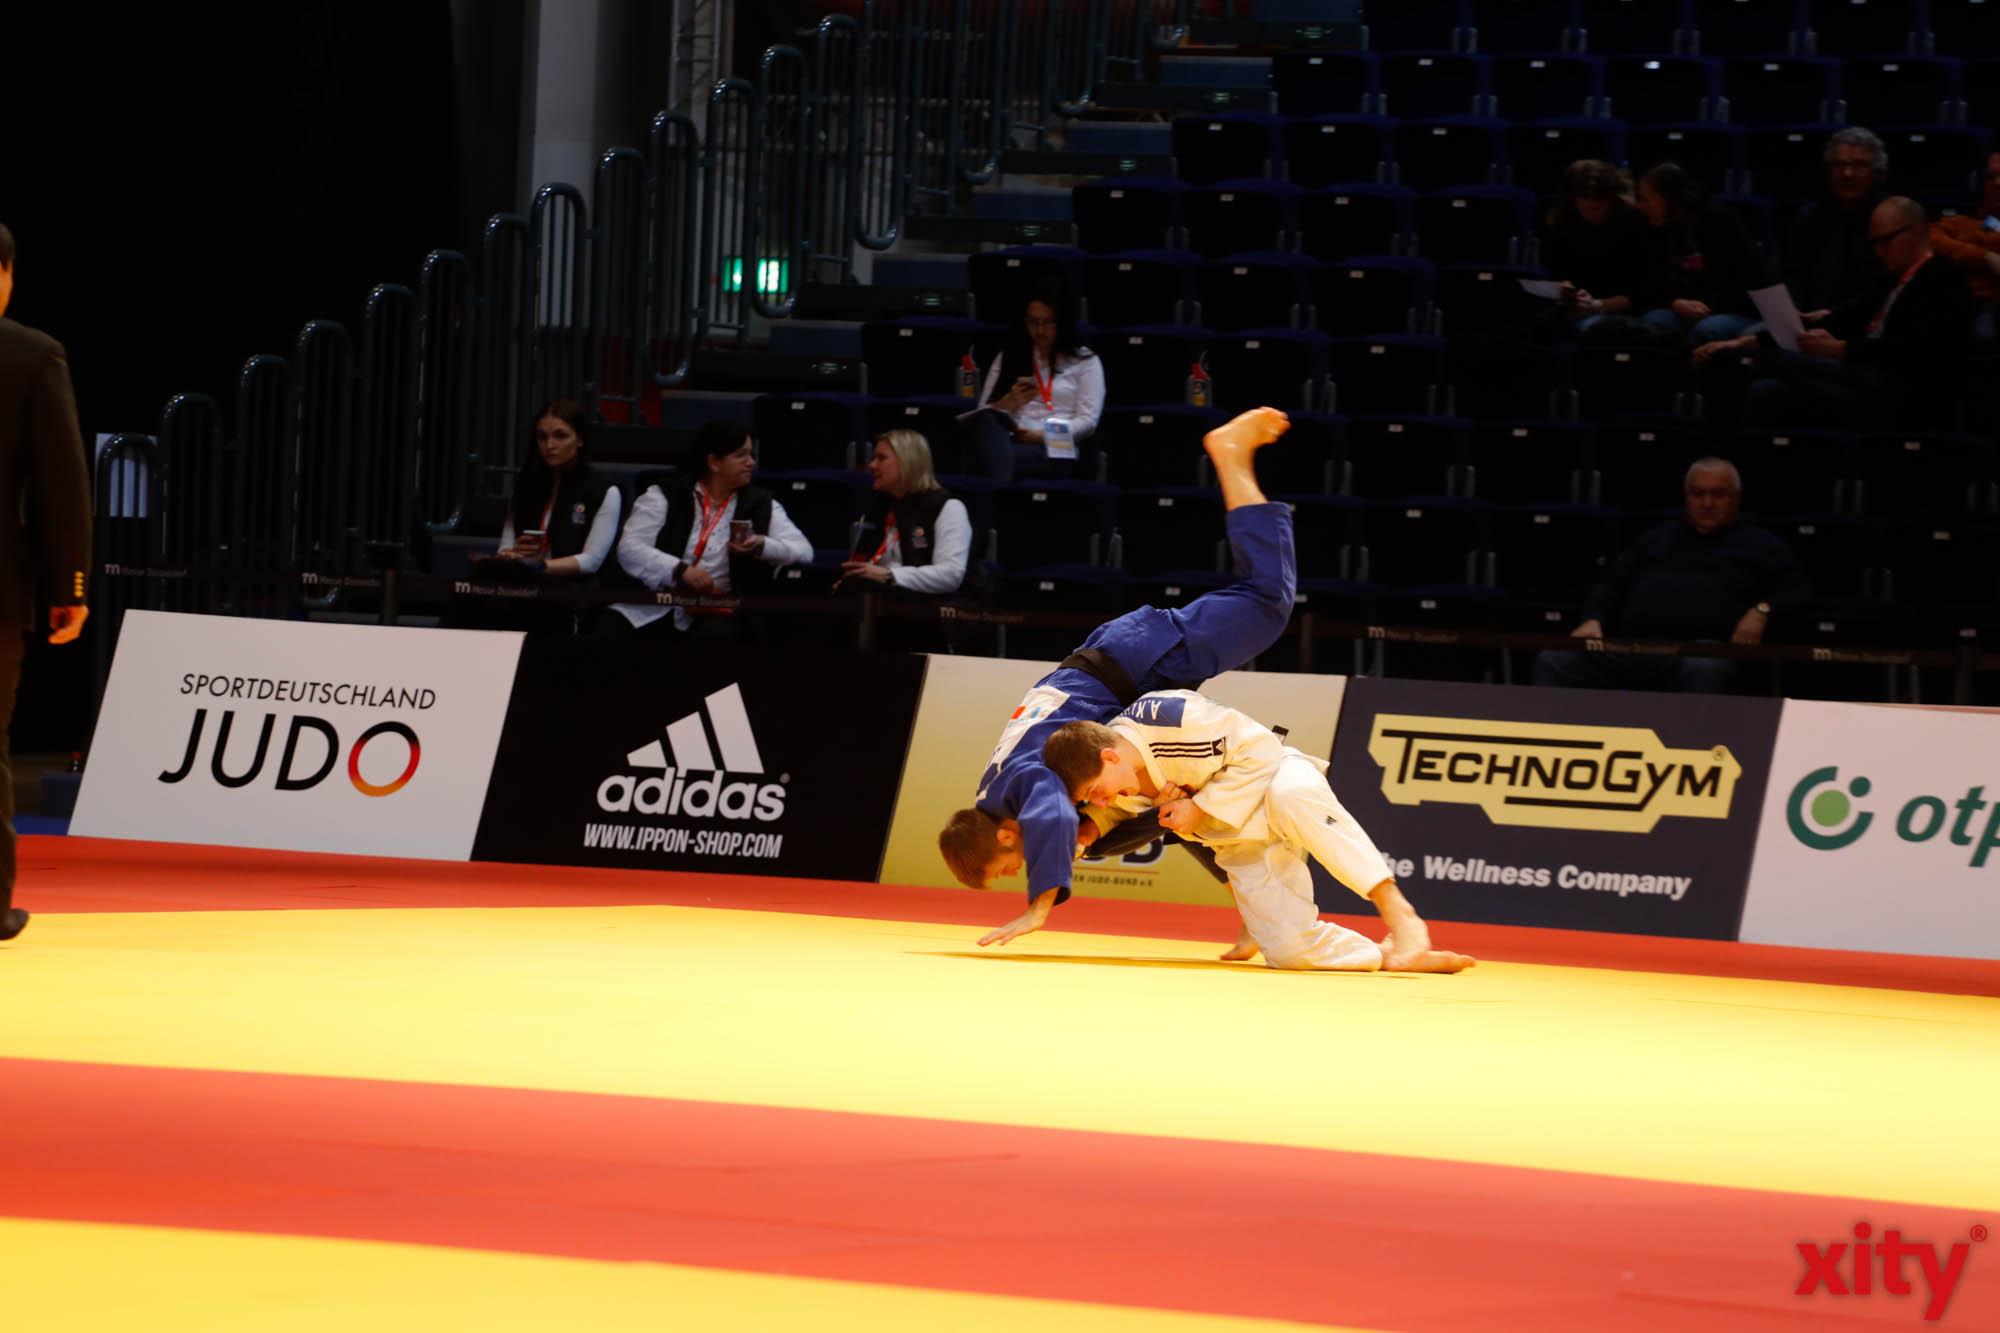 Judo Grand Prix Düsseldorf in der Mitsubishi Electric Halle (Foto: xity)